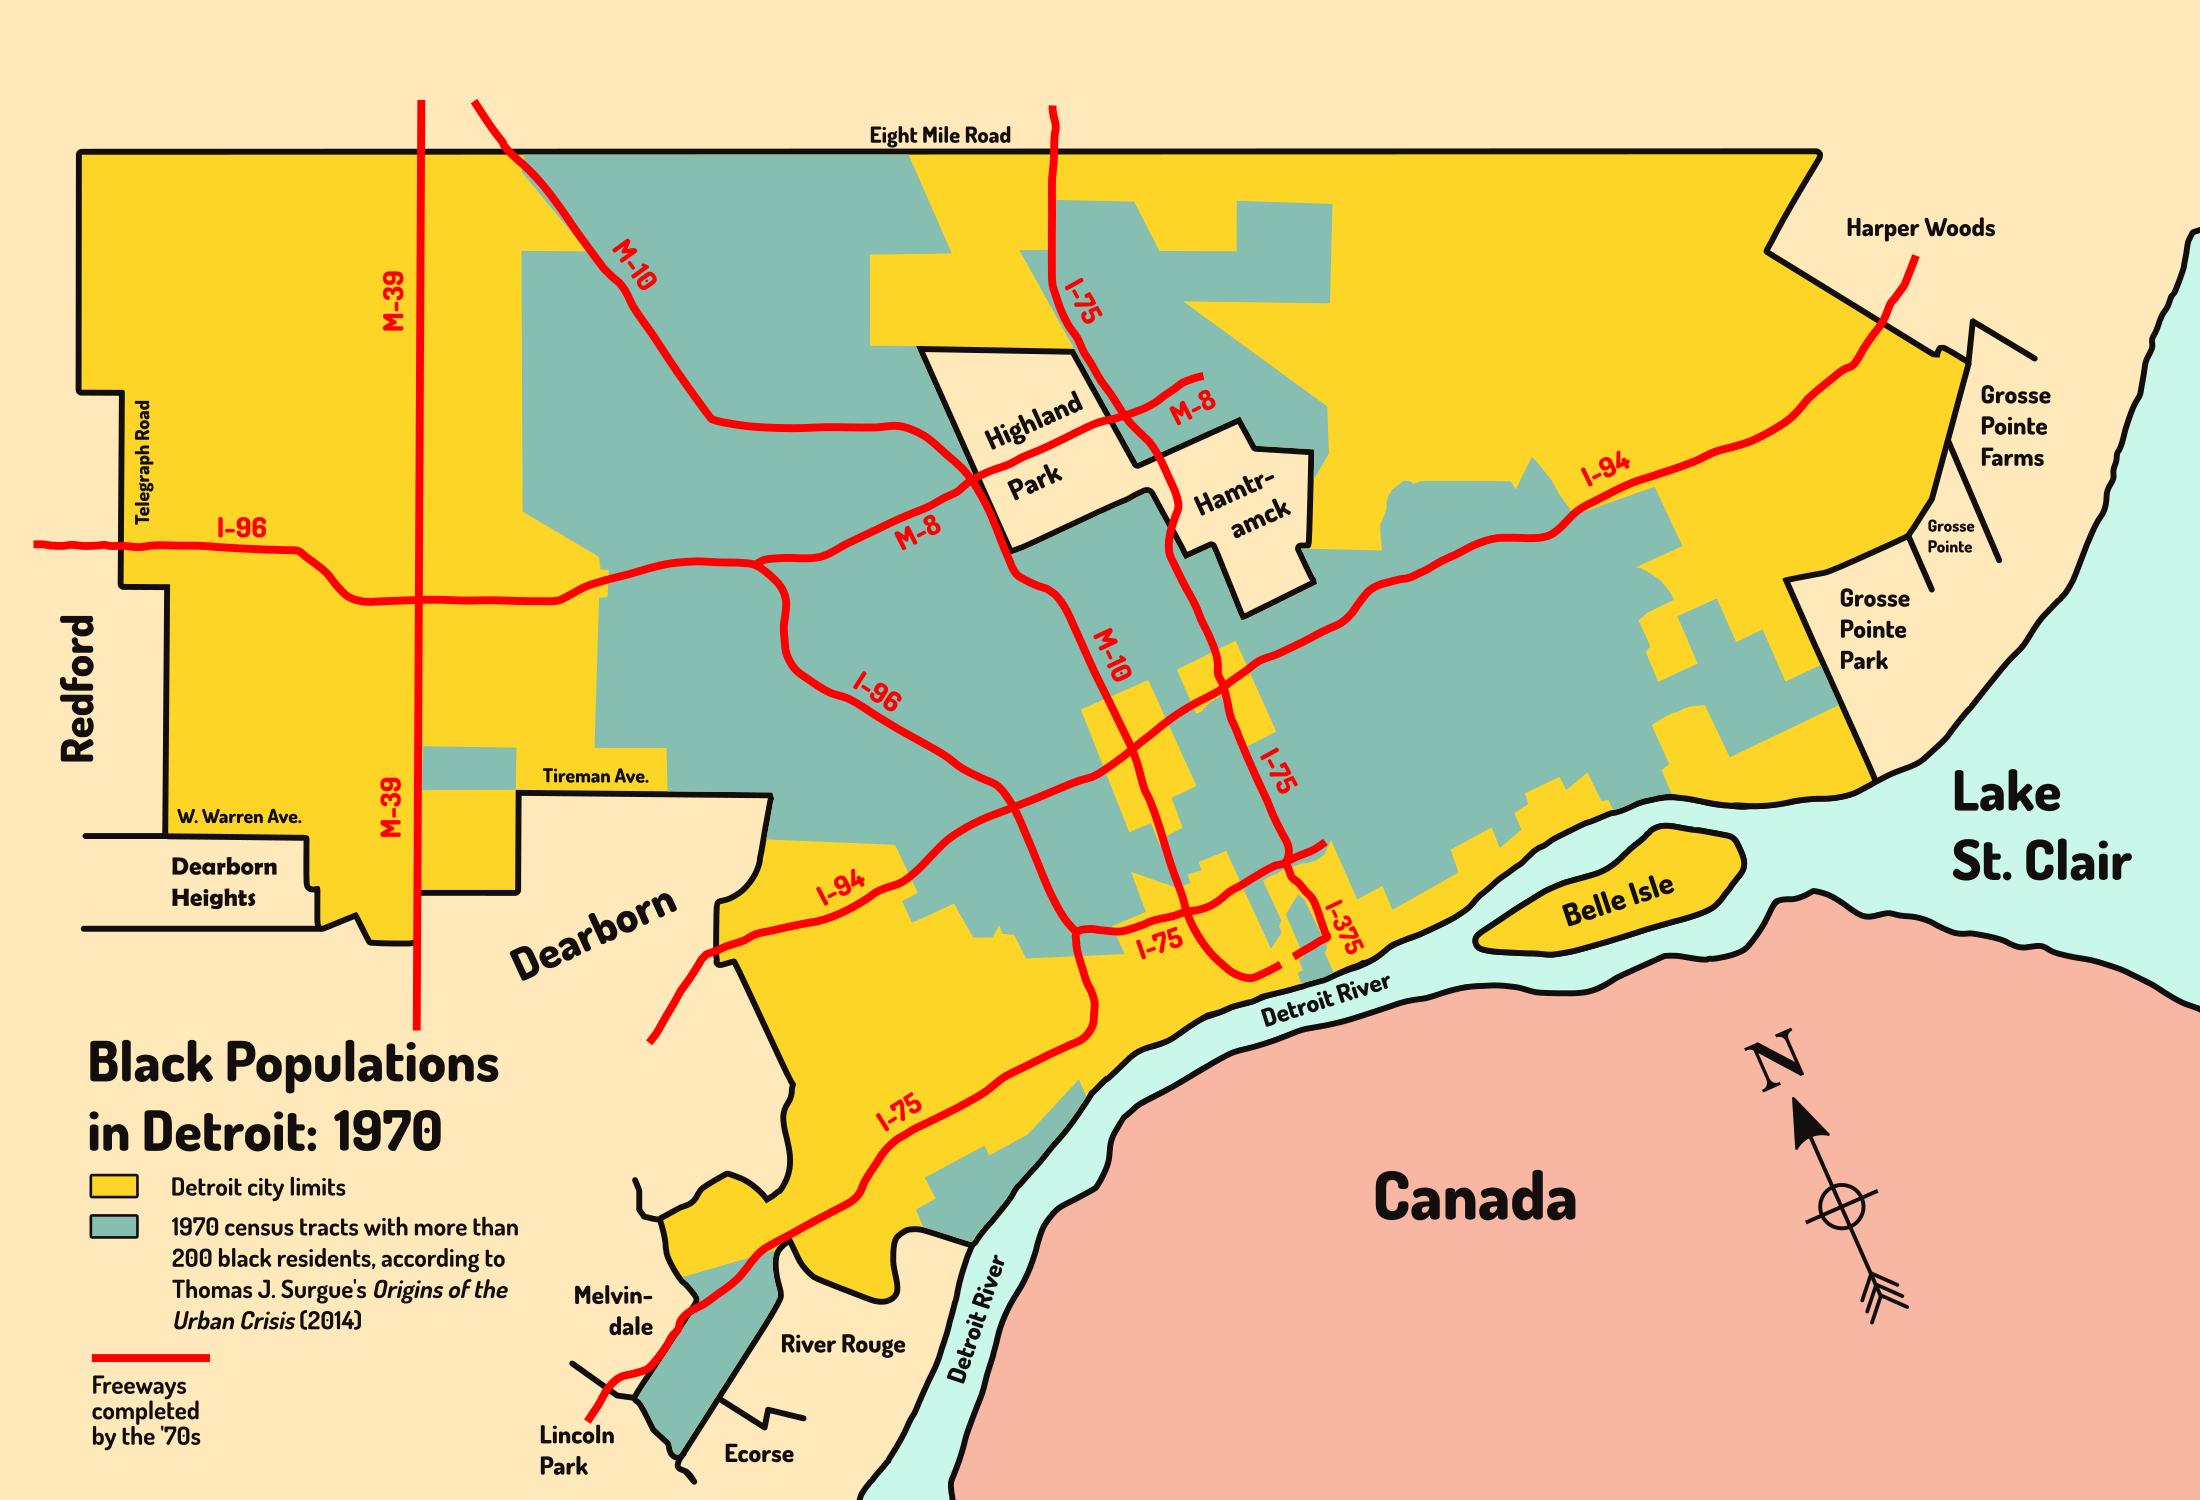 Detroit's Black Population: 1970